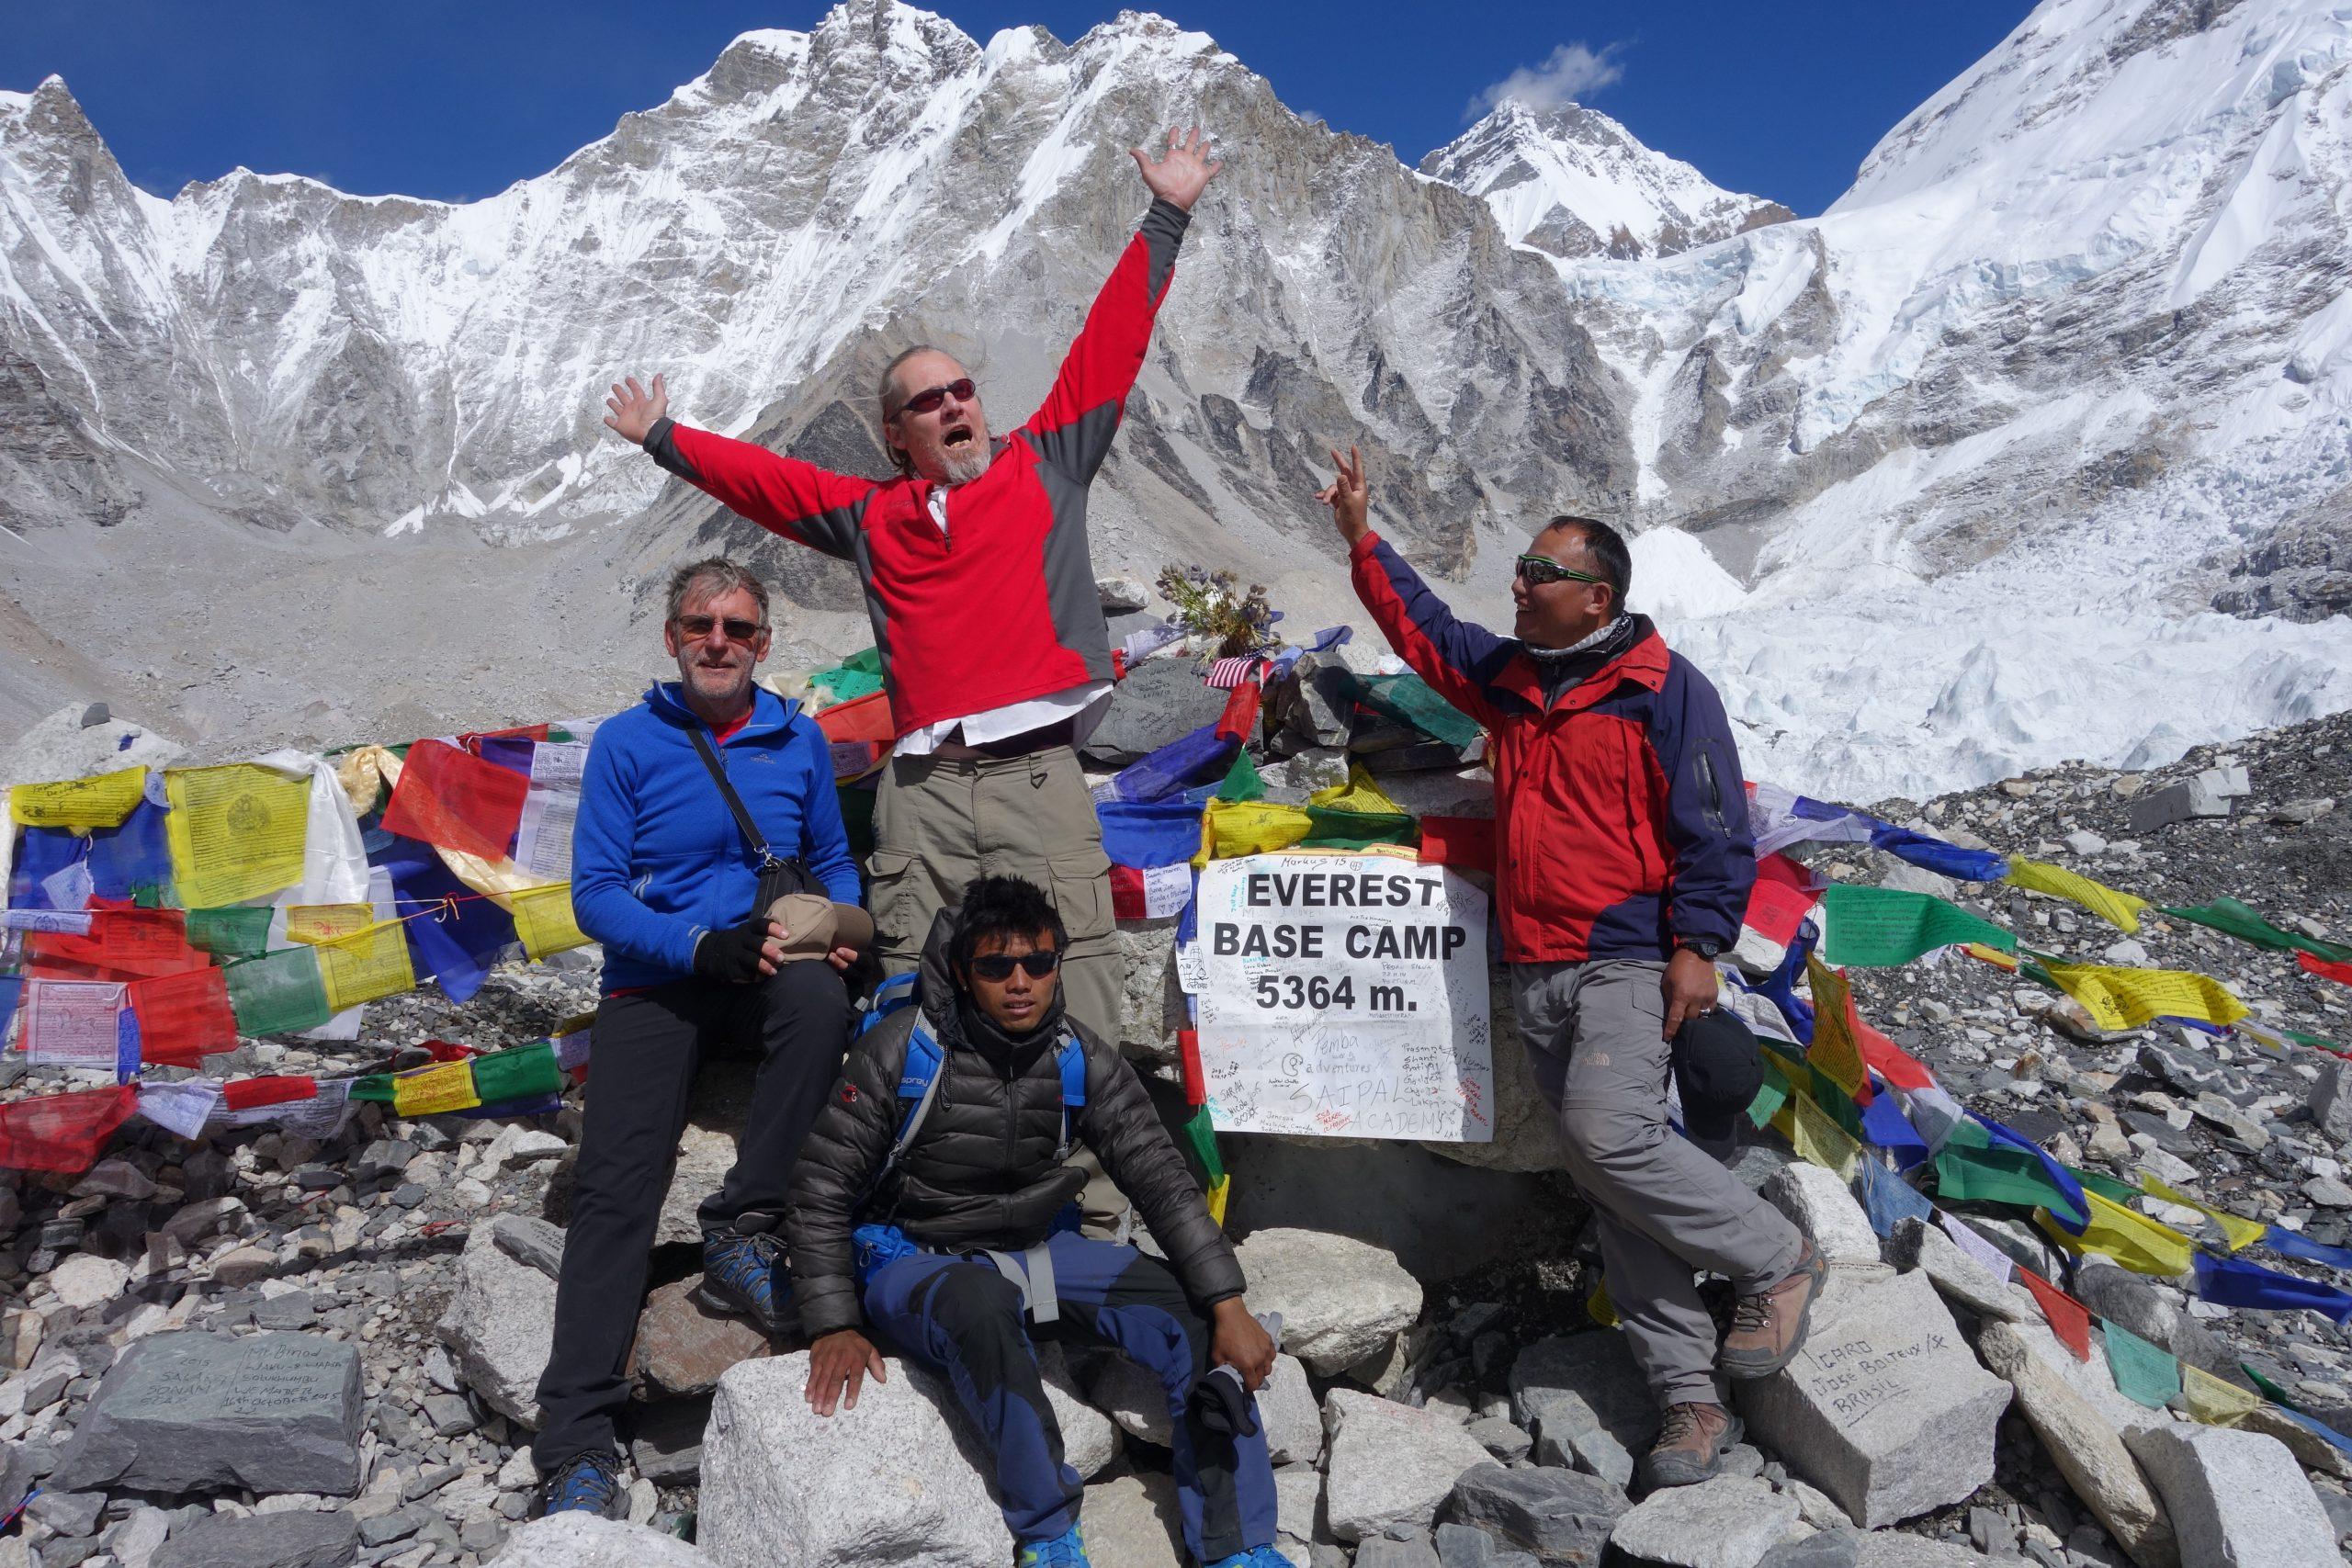 Everest Three High Passes Trek 16 days 5